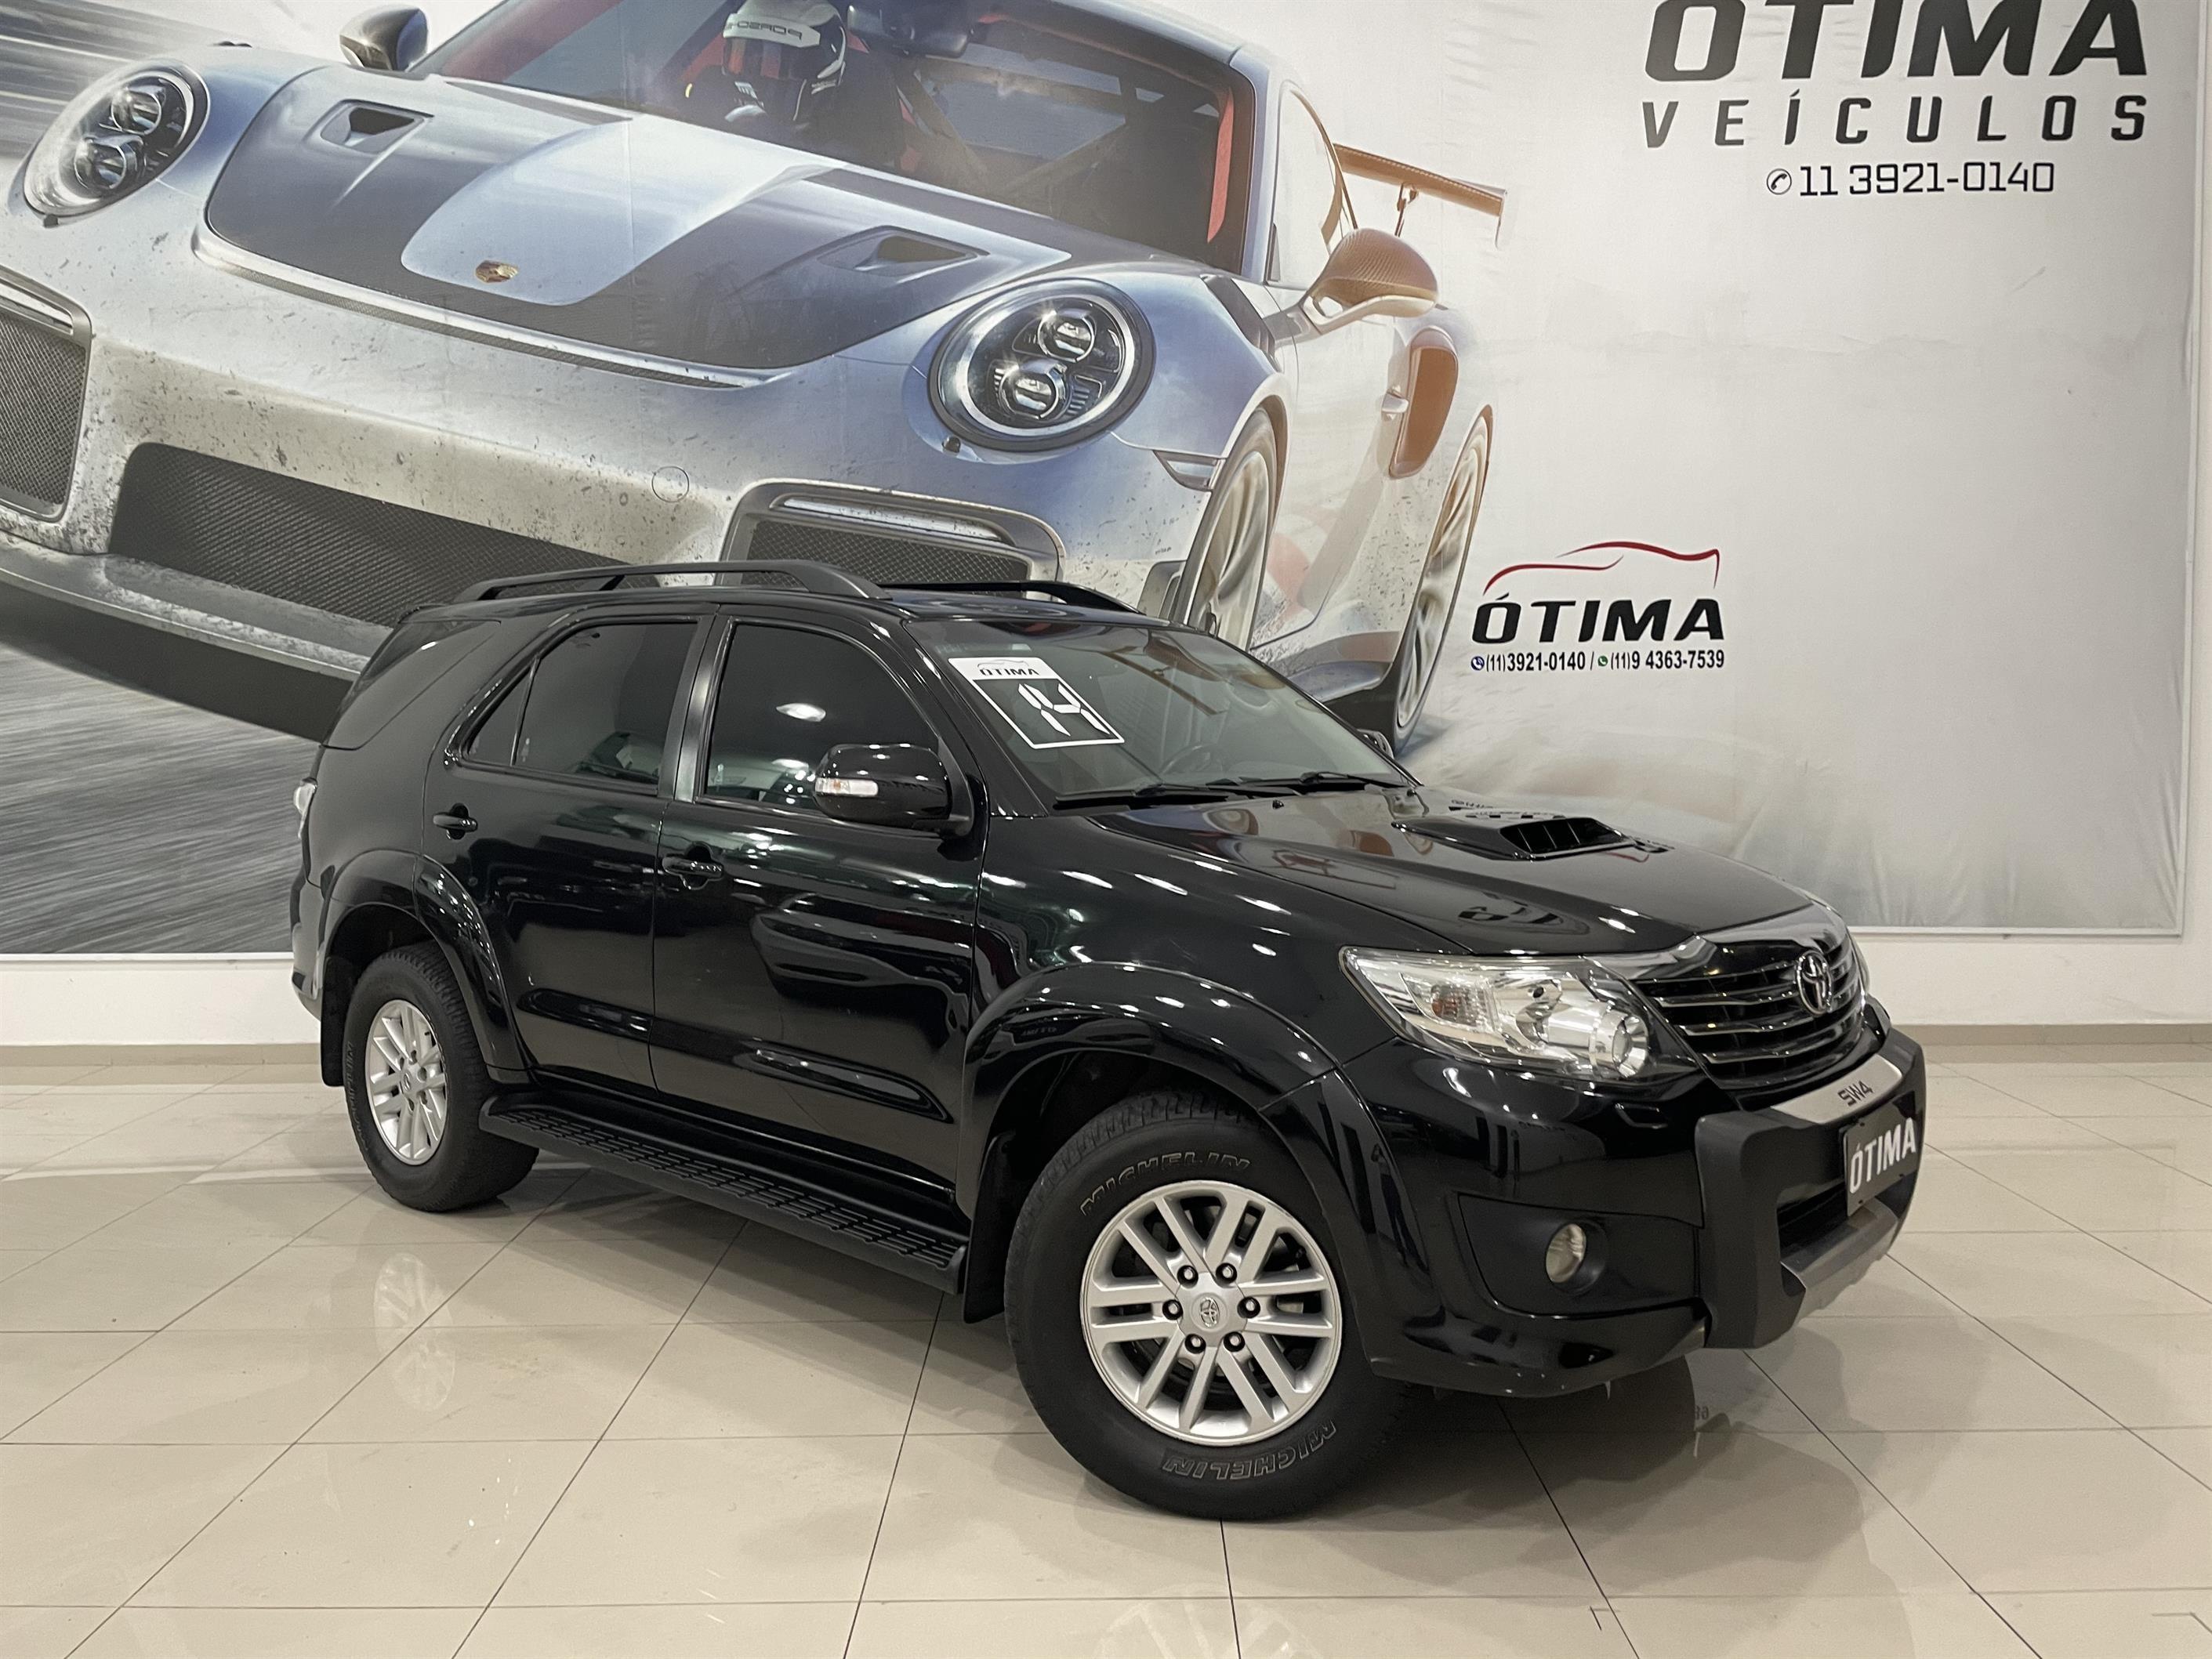 //www.autoline.com.br/carro/toyota/hilux-30-cd-srv-16v-diesel-4p-4x4-turbo-automatico/2014/sao-paulo-sp/15636629